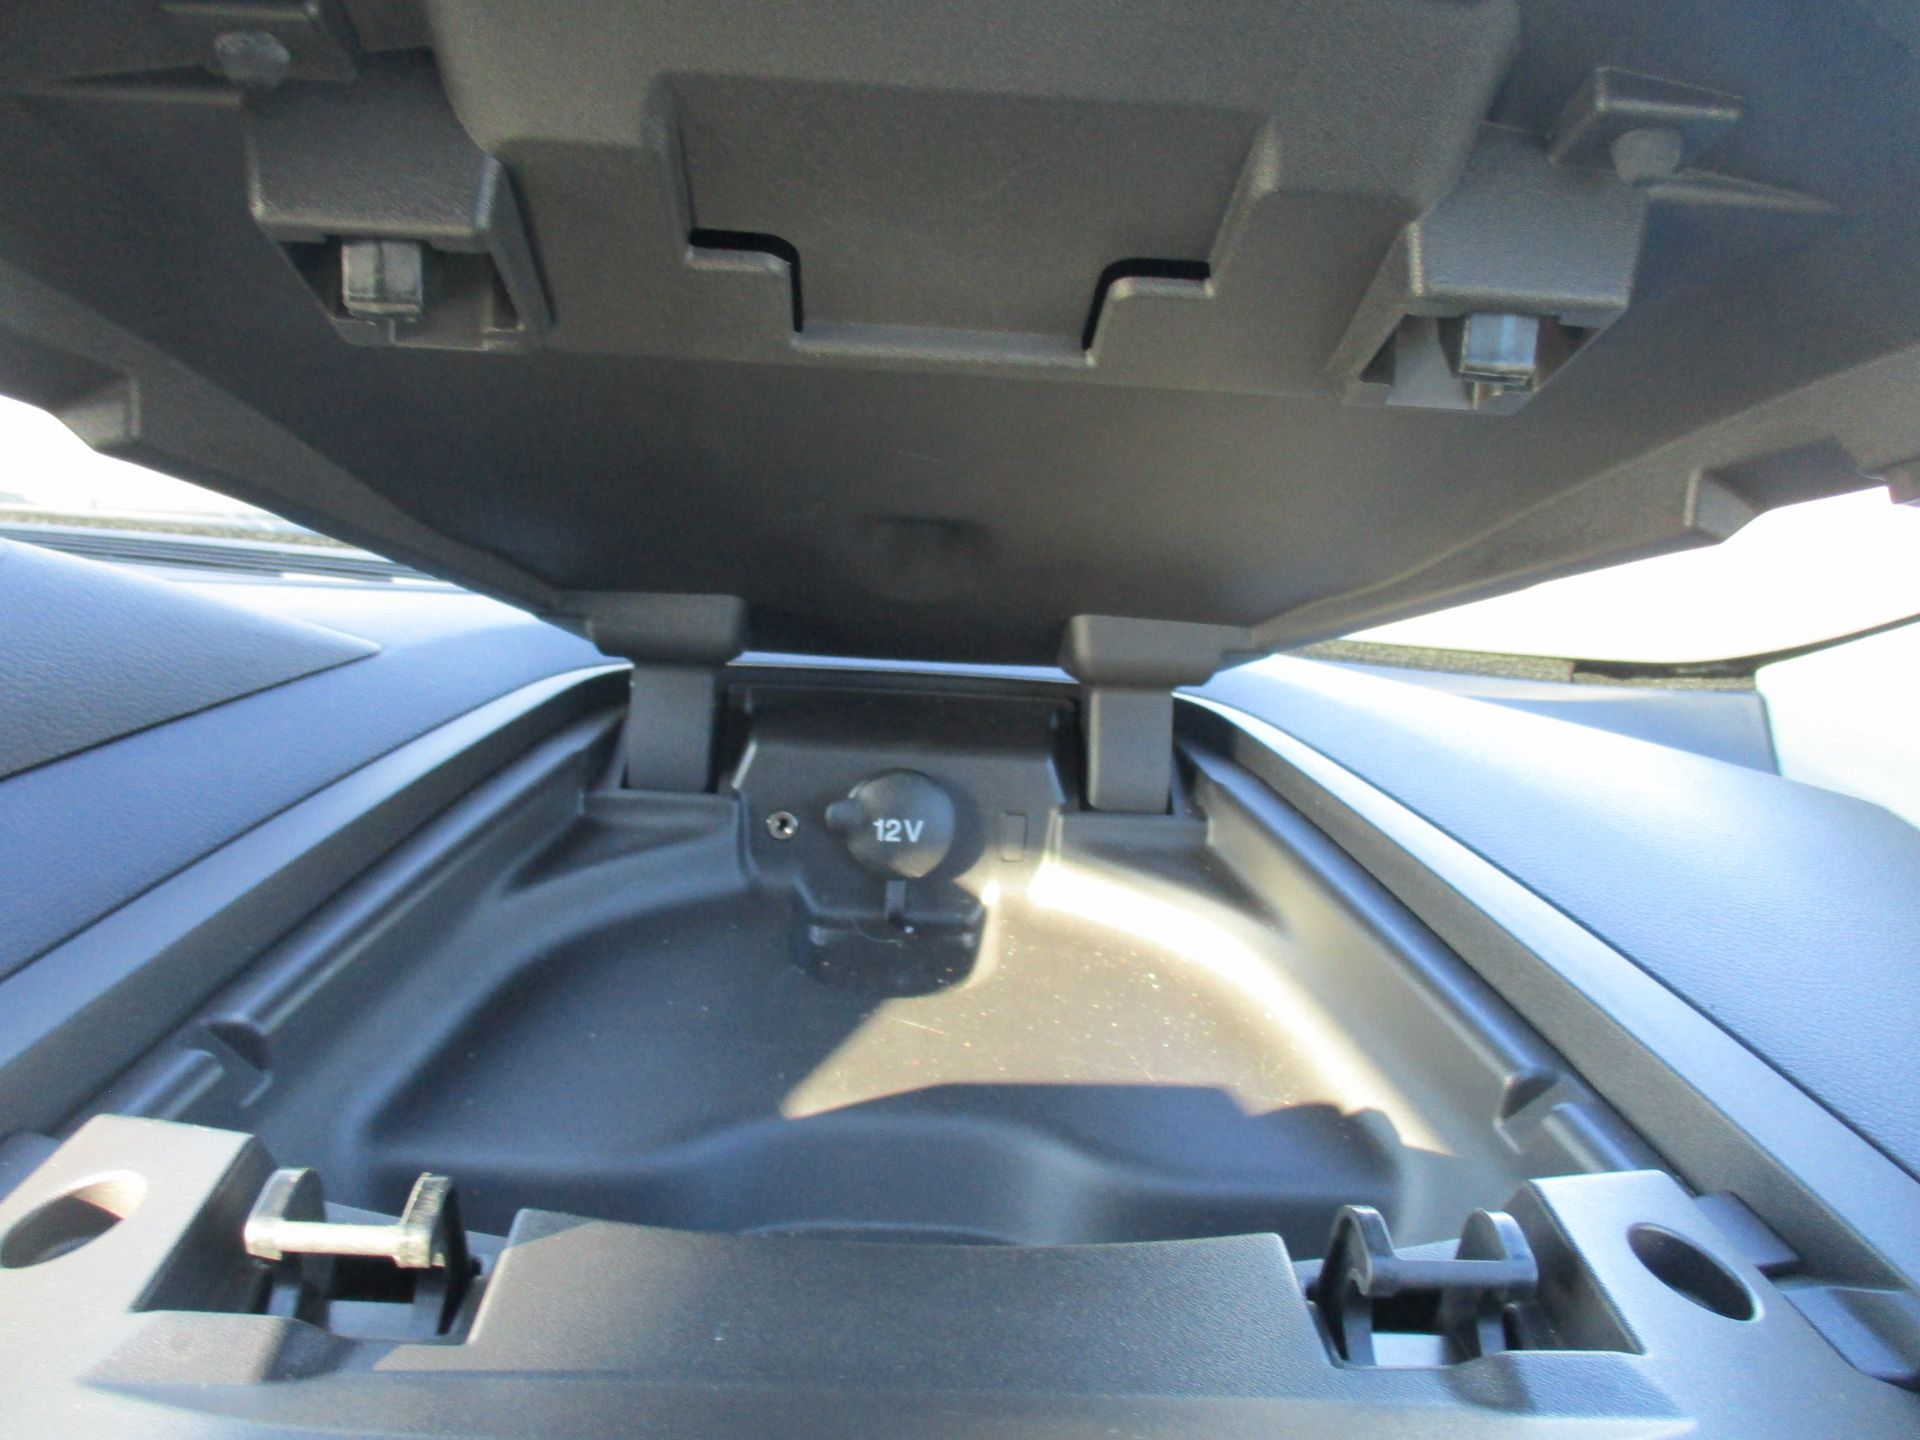 2017 Ford Transit Custom 290 L1 DIESEL FWD 2.0 TDCI 105PS LOW ROOF VAN EURO 6 (BN17PNJ) Image 22